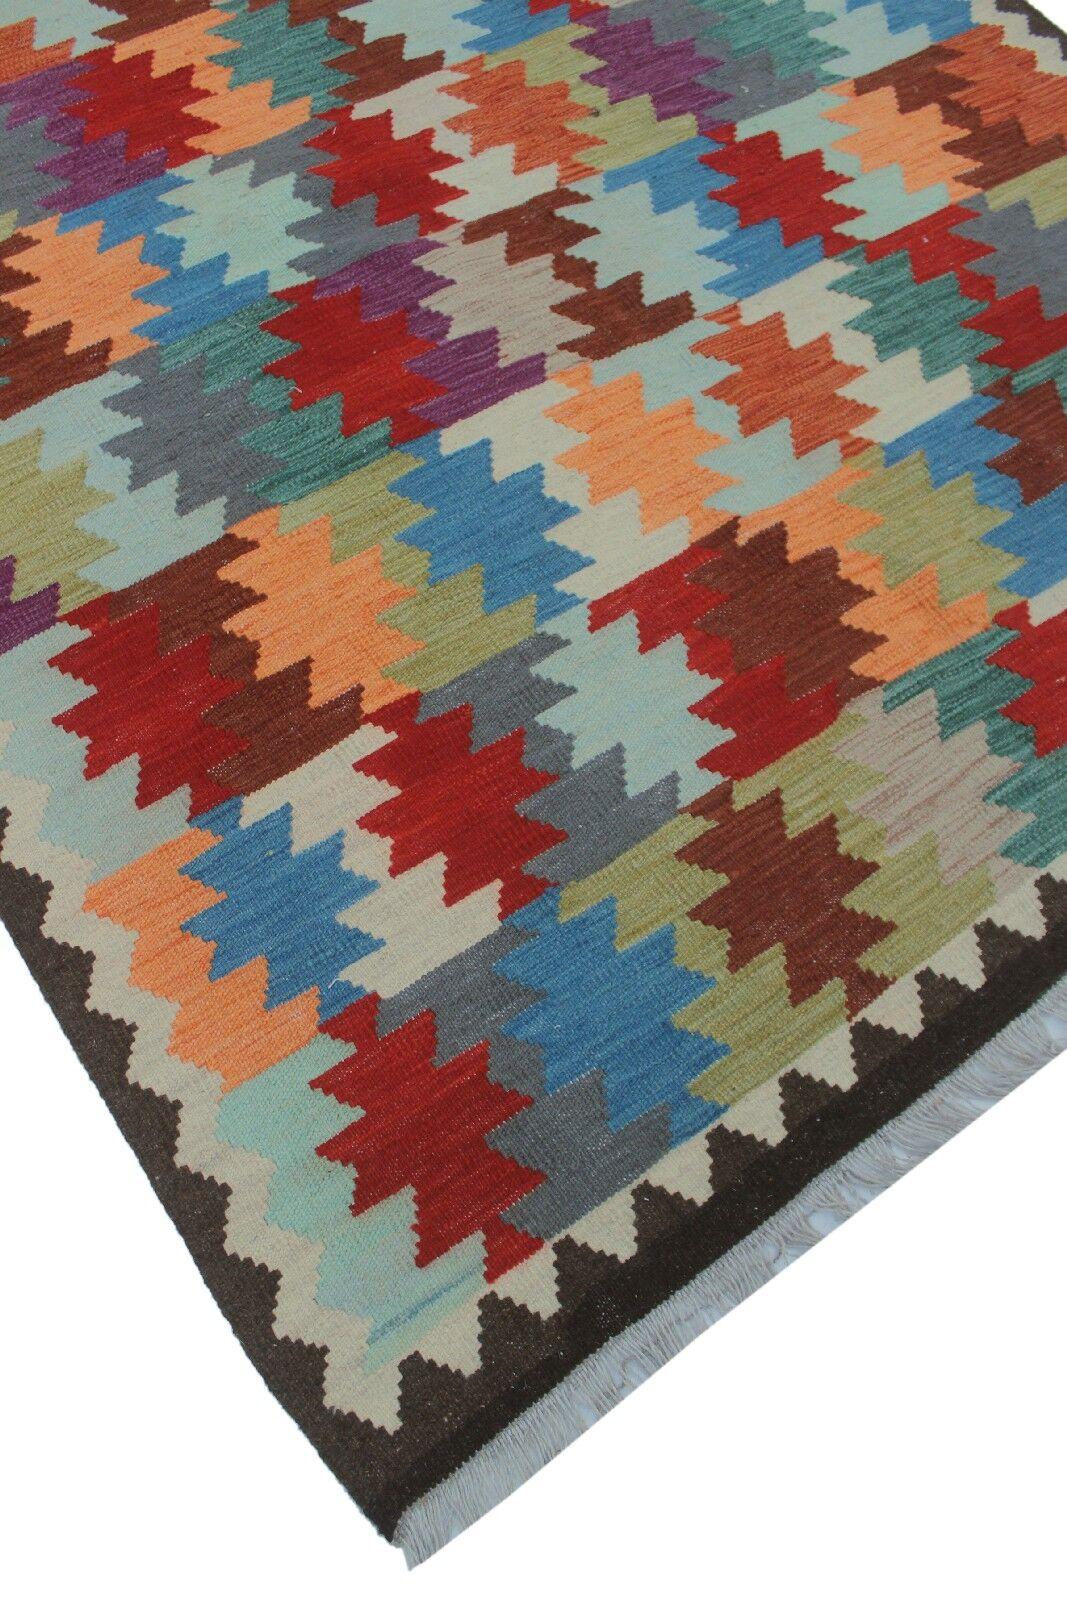 Rucker Kilim Hand Woven Wool Gray/Red Southwestern Area Rug